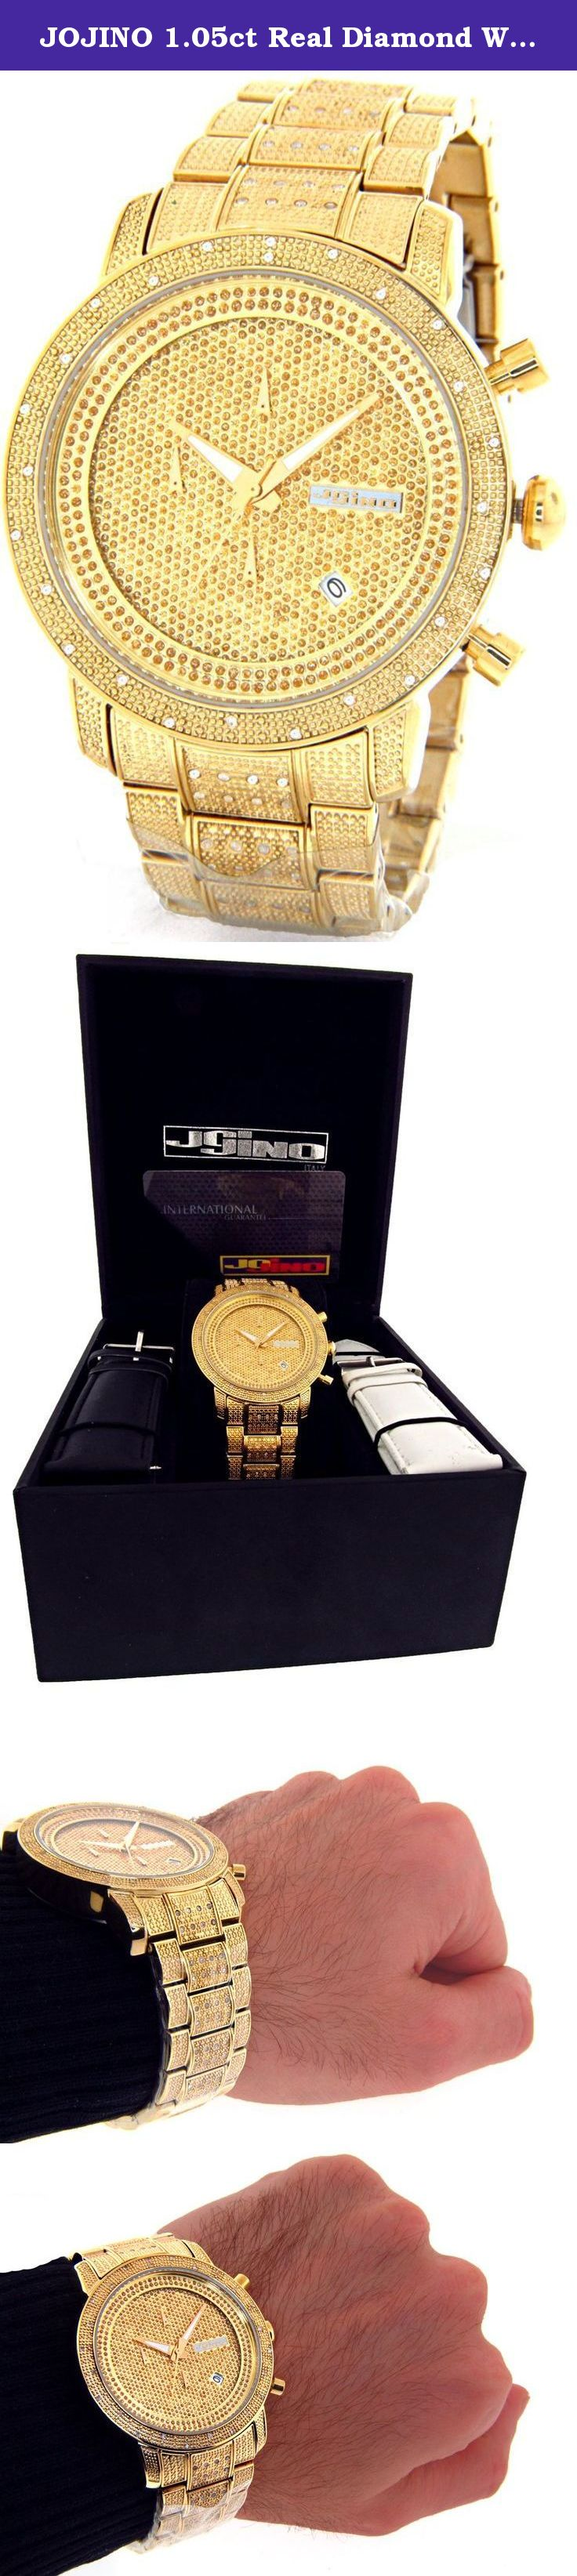 5aa50c6ffc8 JOJINO 1.05ct Real Diamond Watch Mens Deluxe Gold Tone Case Diamond Band  MJ-1000B